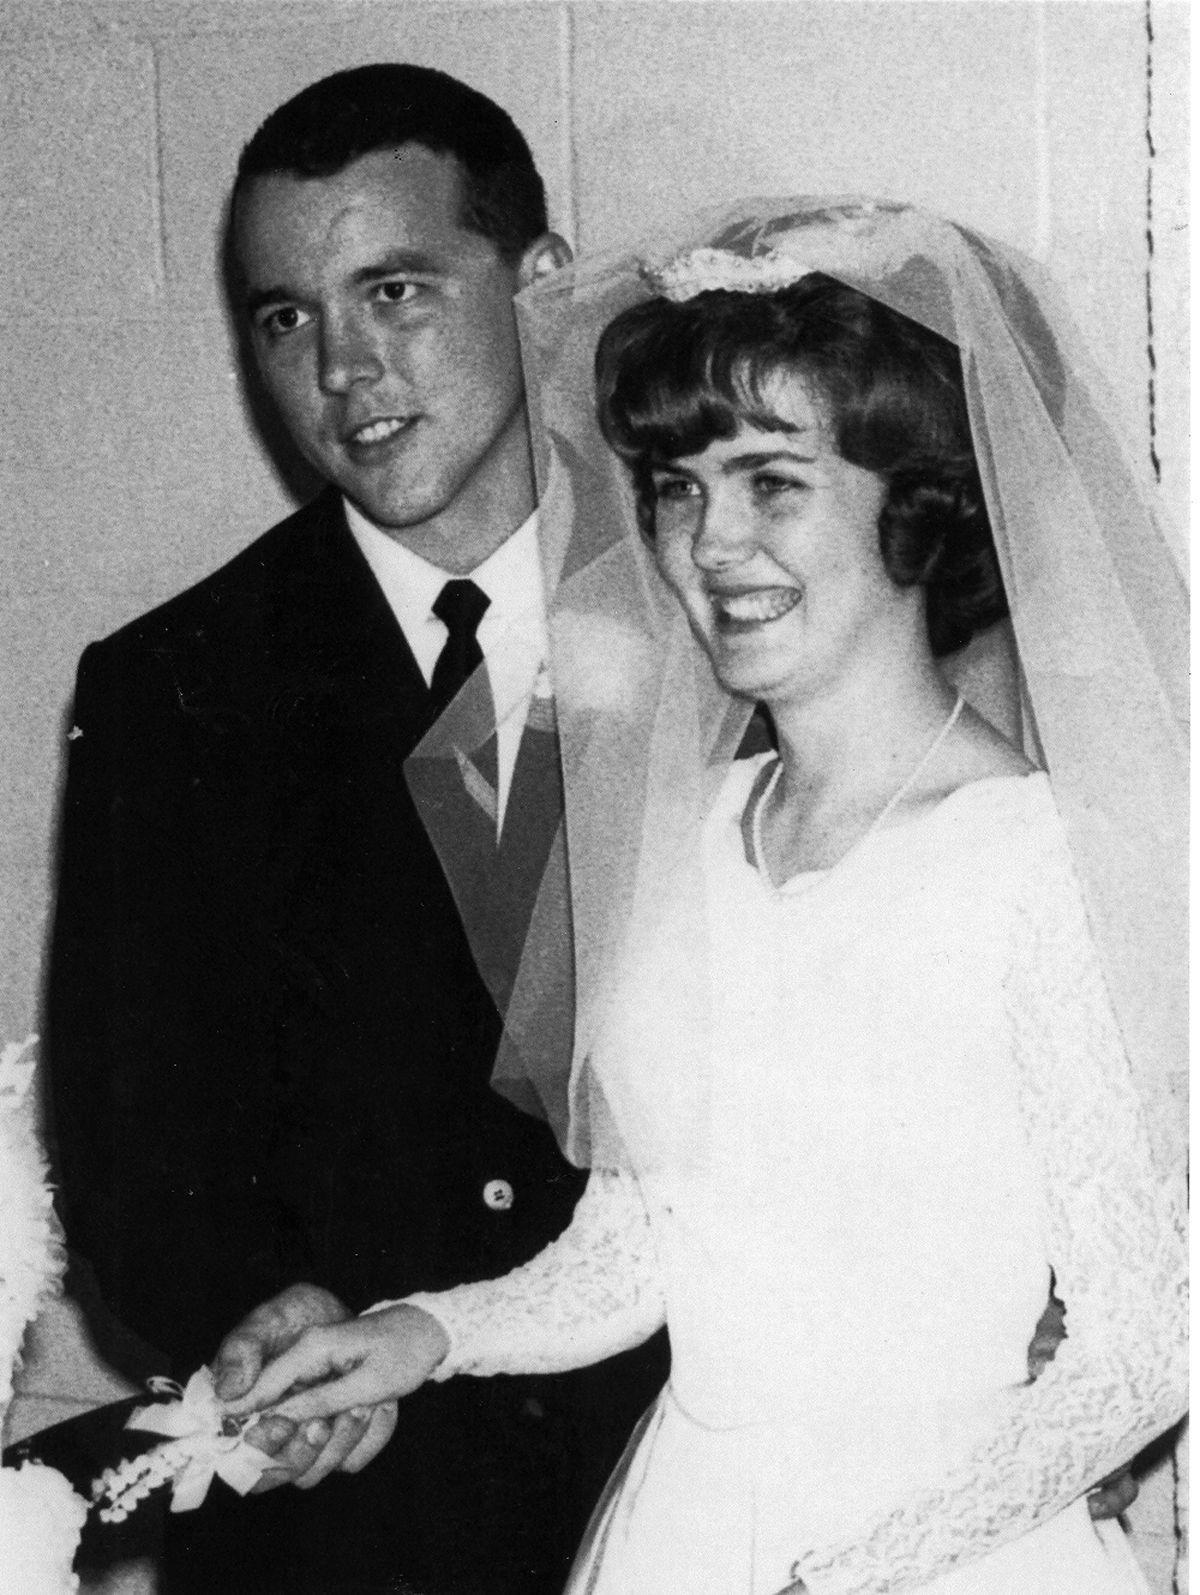 Mac and Nancy Eubanks